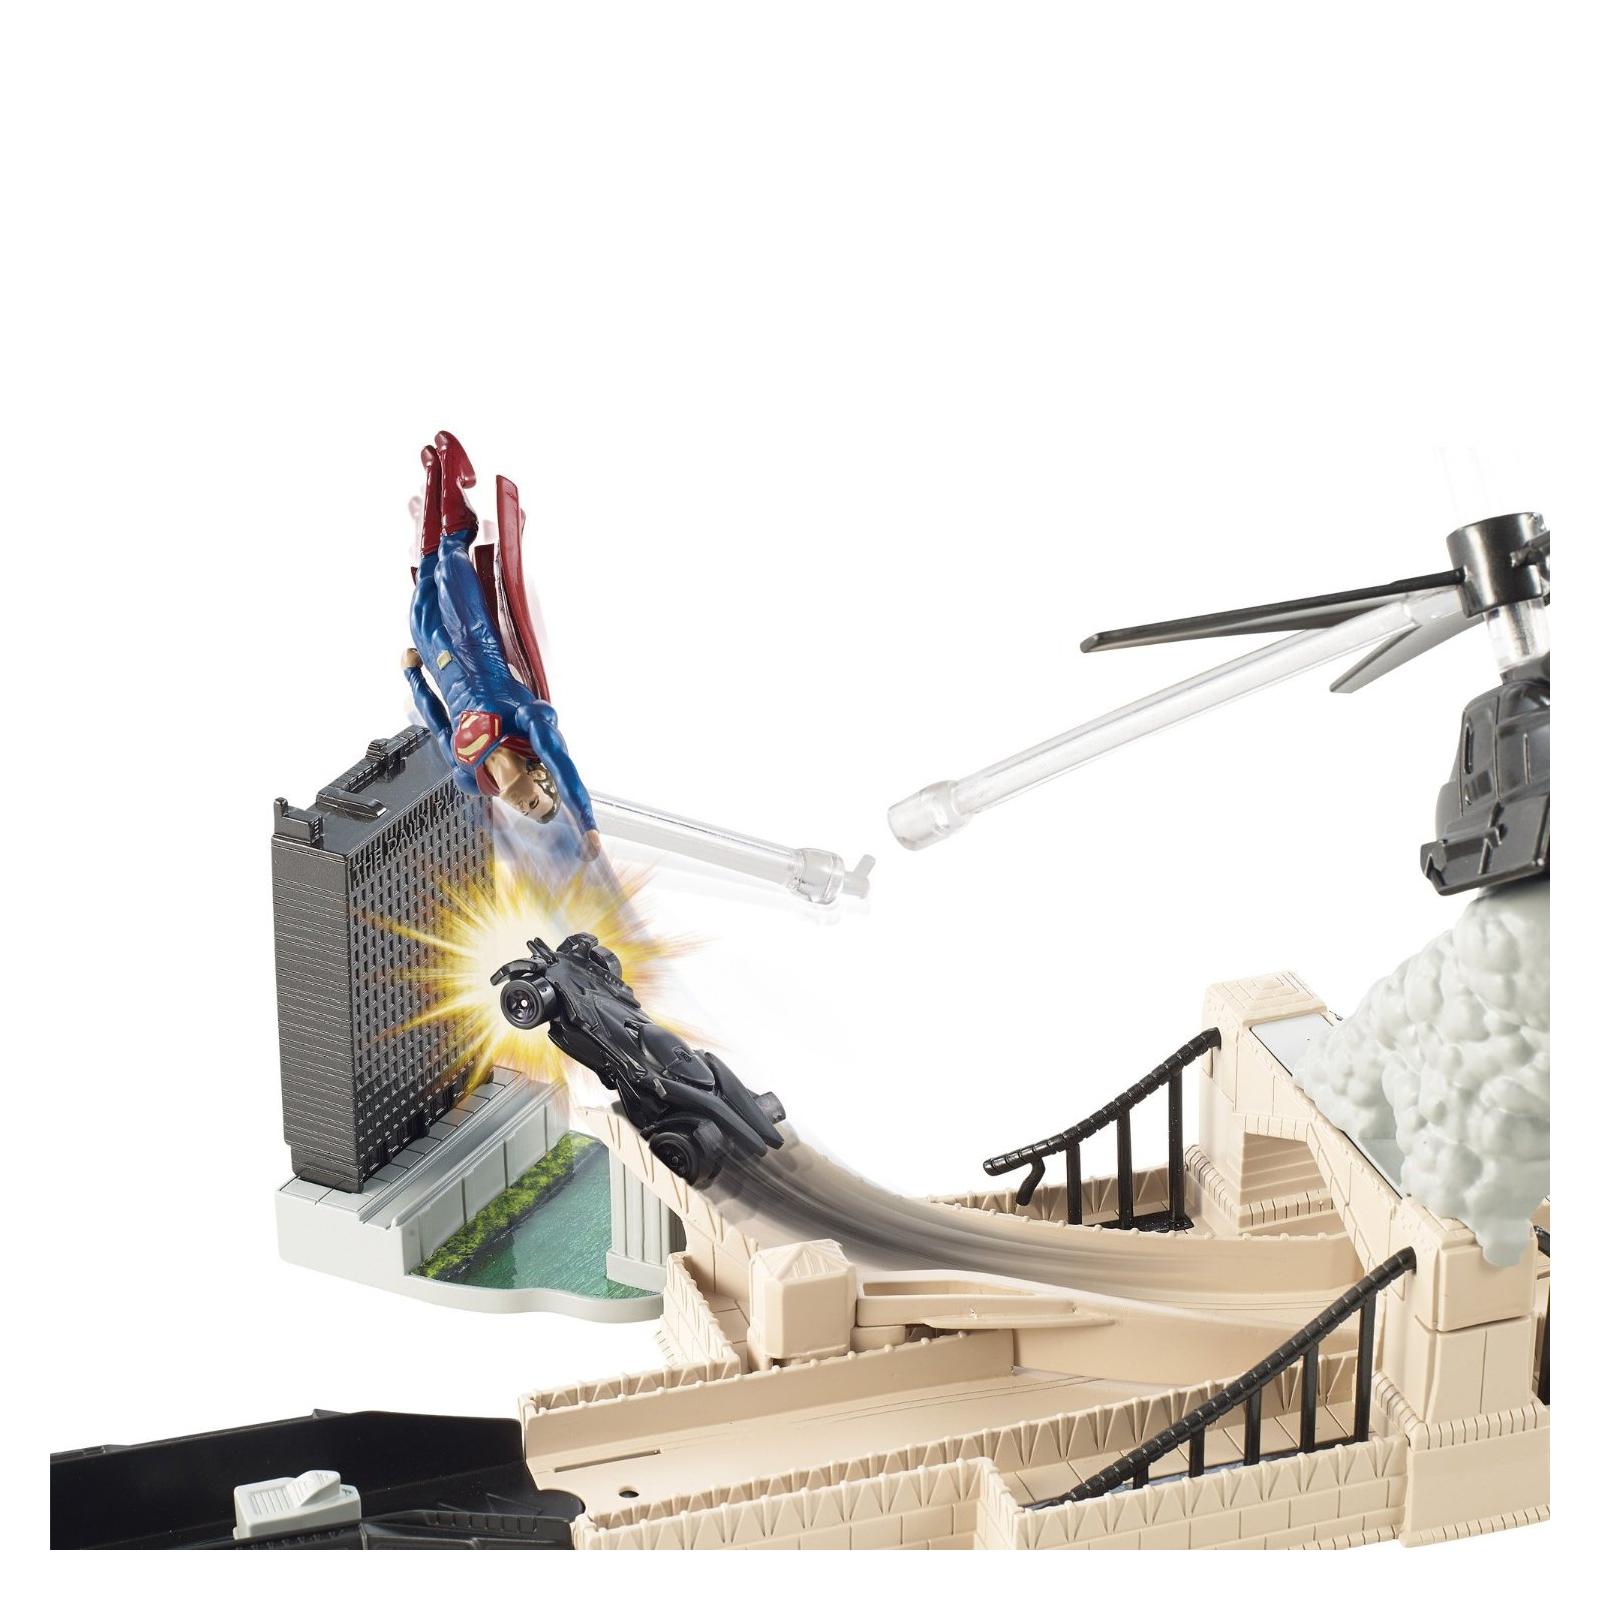 Автотрек HOT WHEELS Битва героев Бэтмен против Супермена (DJH61) изображение 3